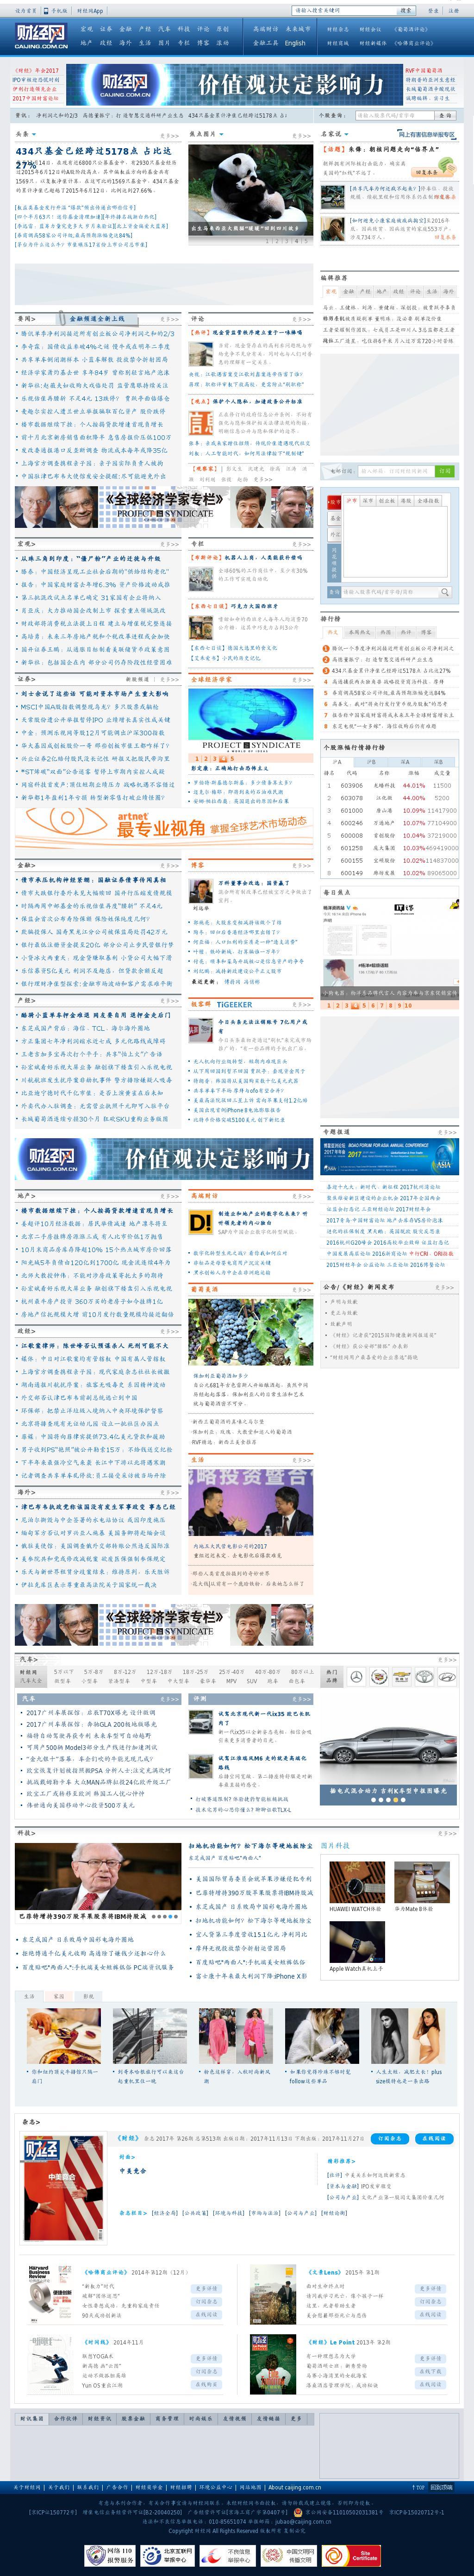 Caijing at Wednesday Nov. 15, 2017, 11:01 p.m. UTC